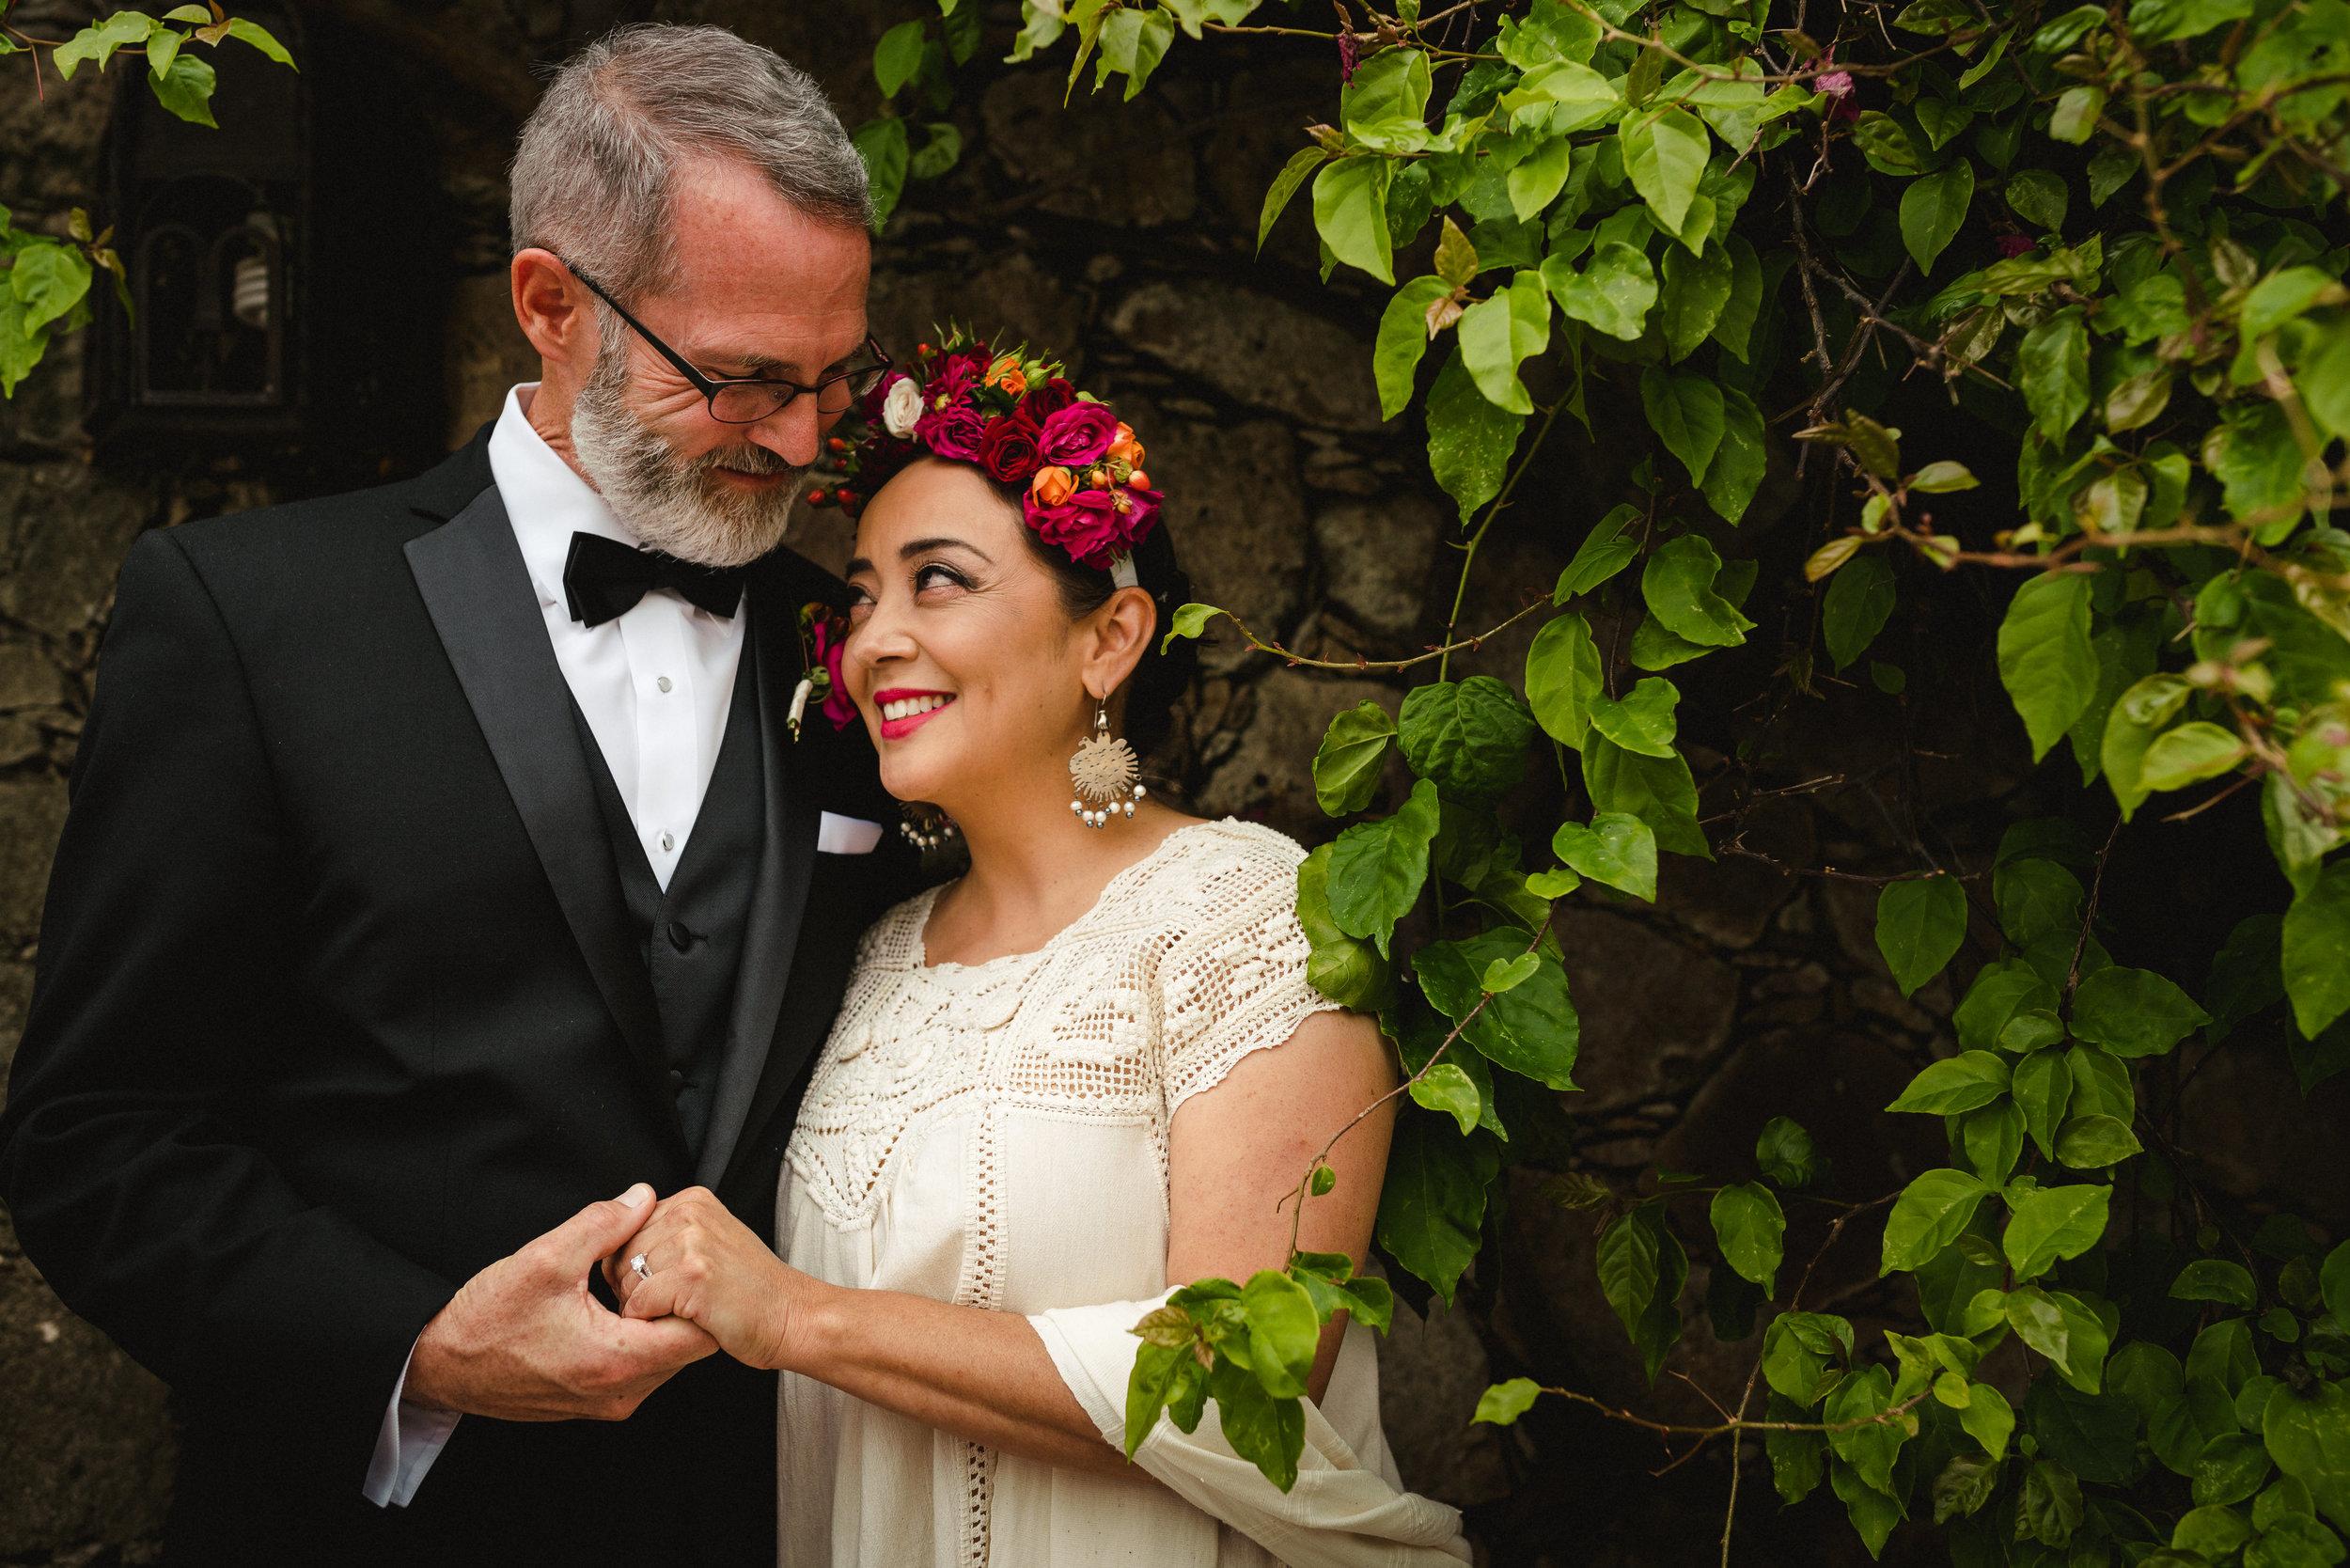 MaurizioSolisBroca-casa-carino-san-miguel-de-allende-wedding-44.jpg